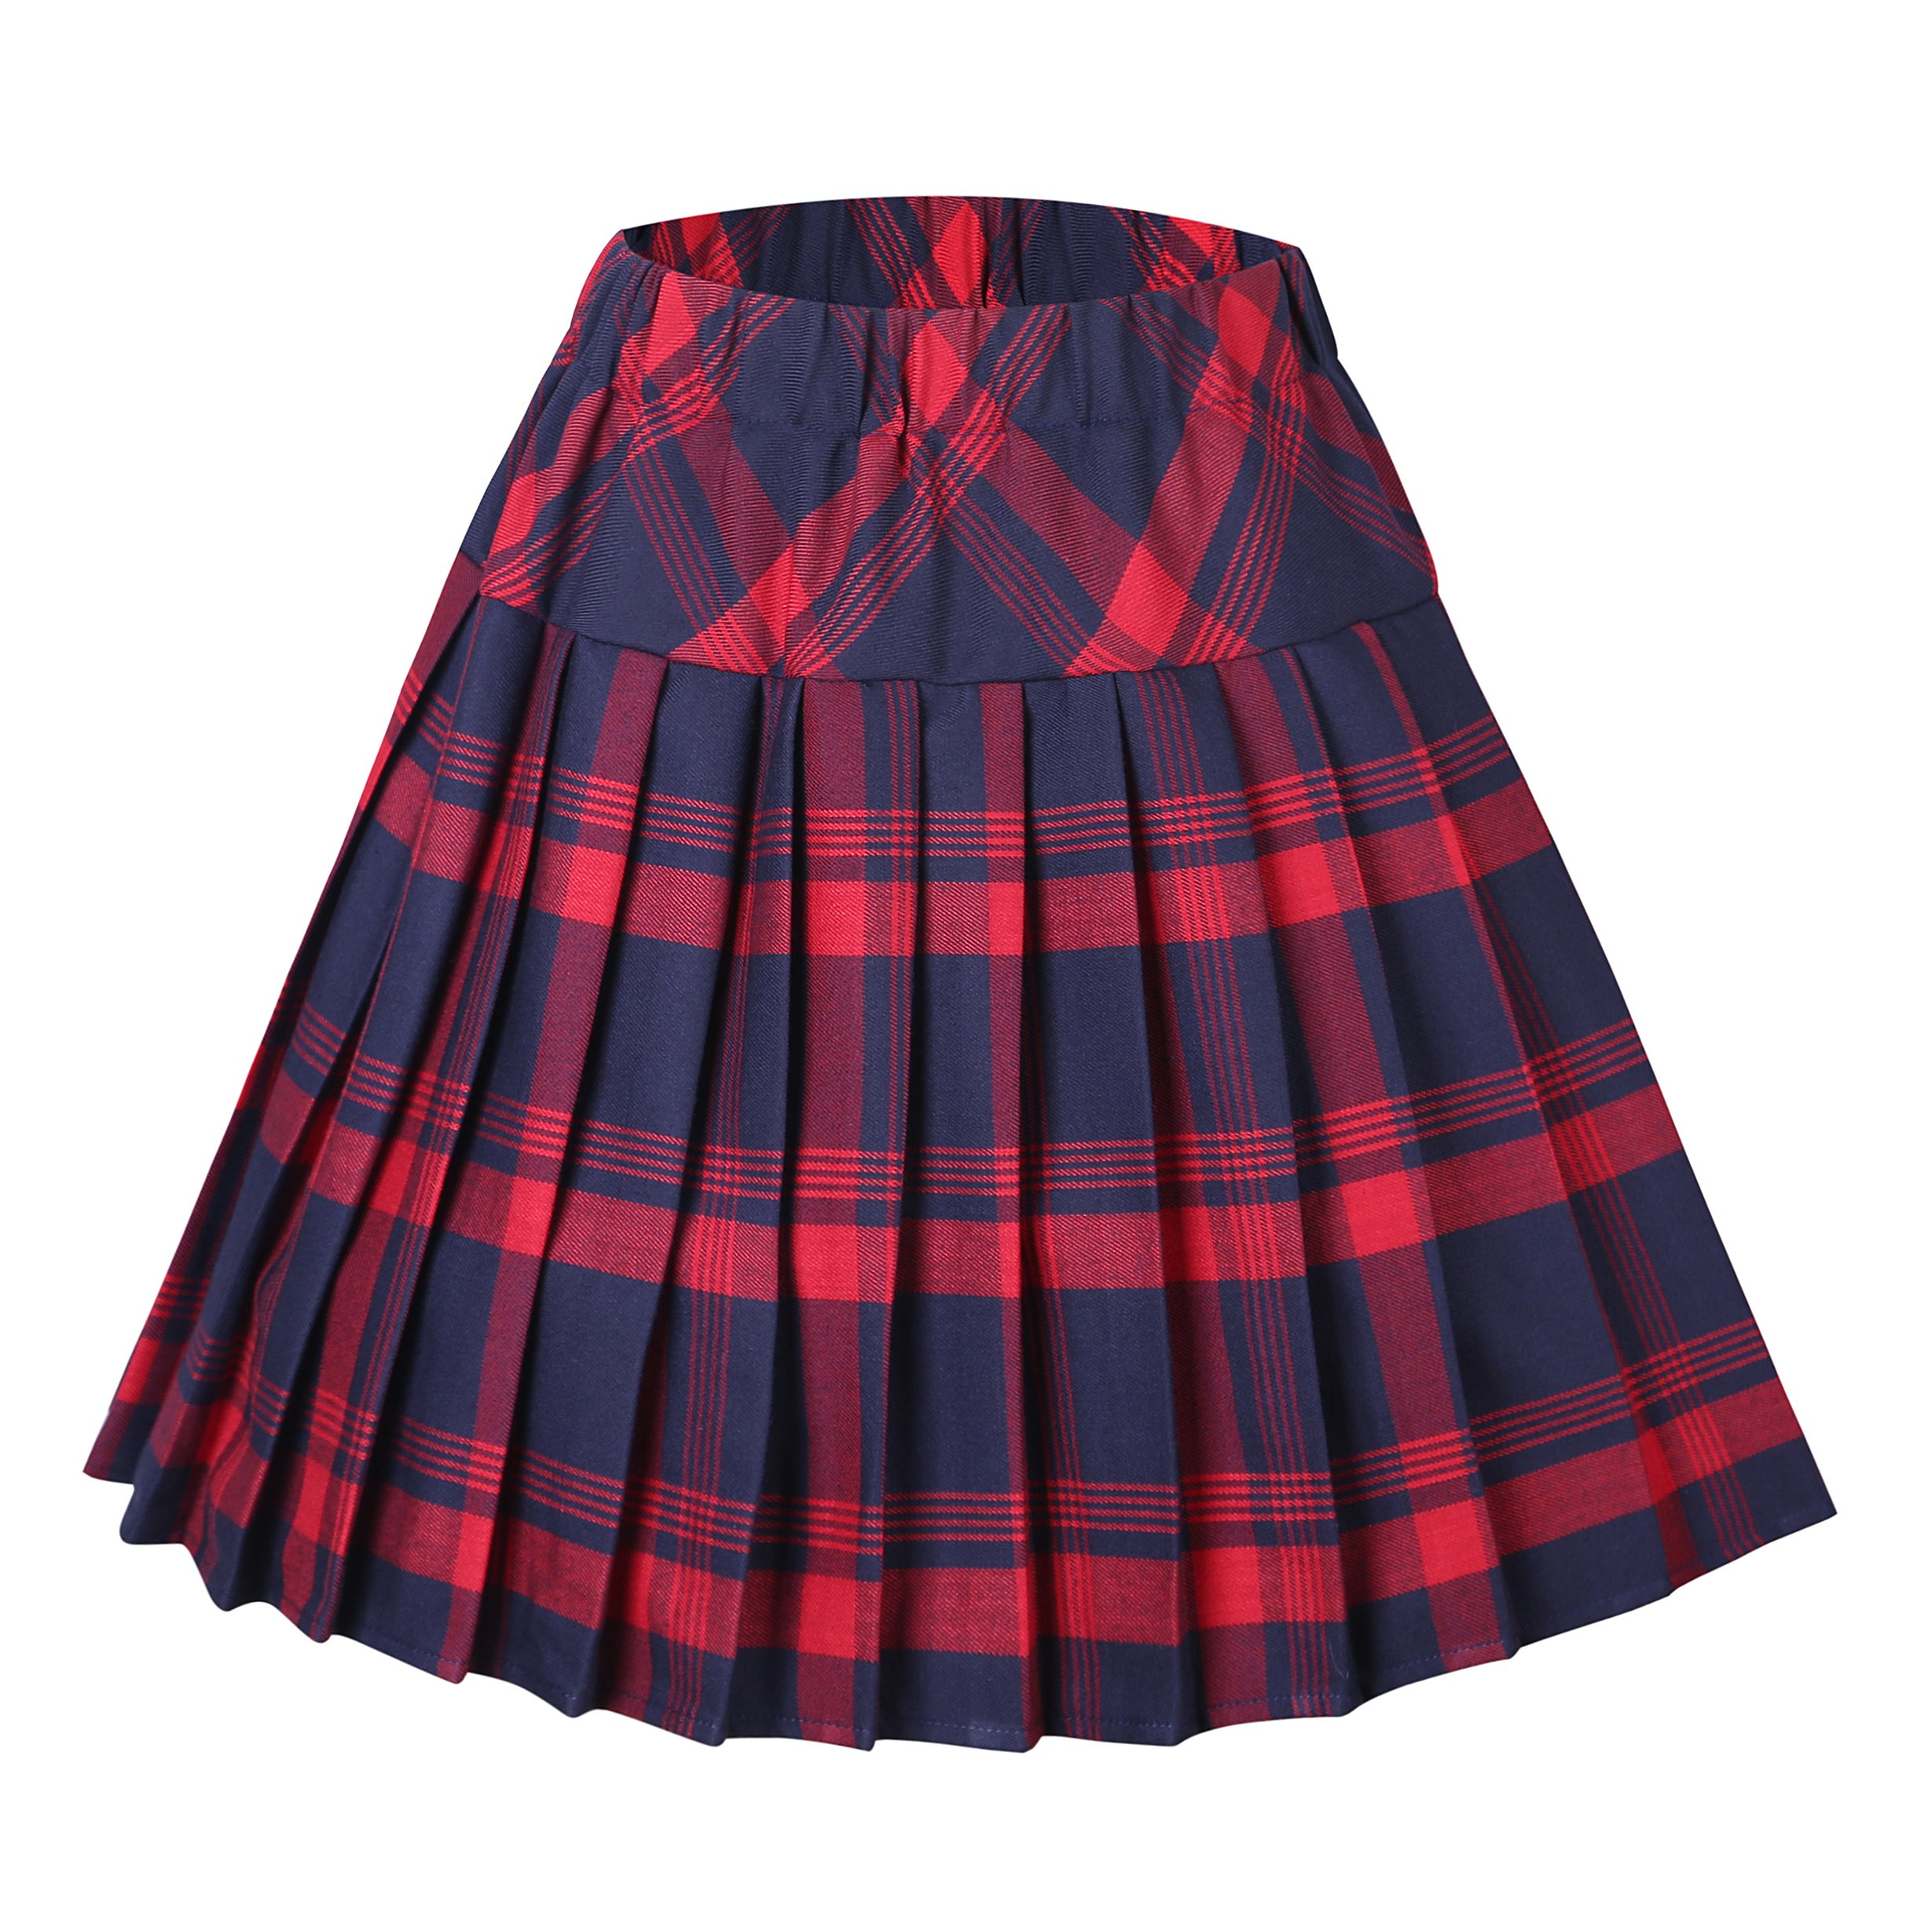 Urban CoCo Women's Elastic Waist Tartan Pleated School Skirt (X-Large, Series 1 red)